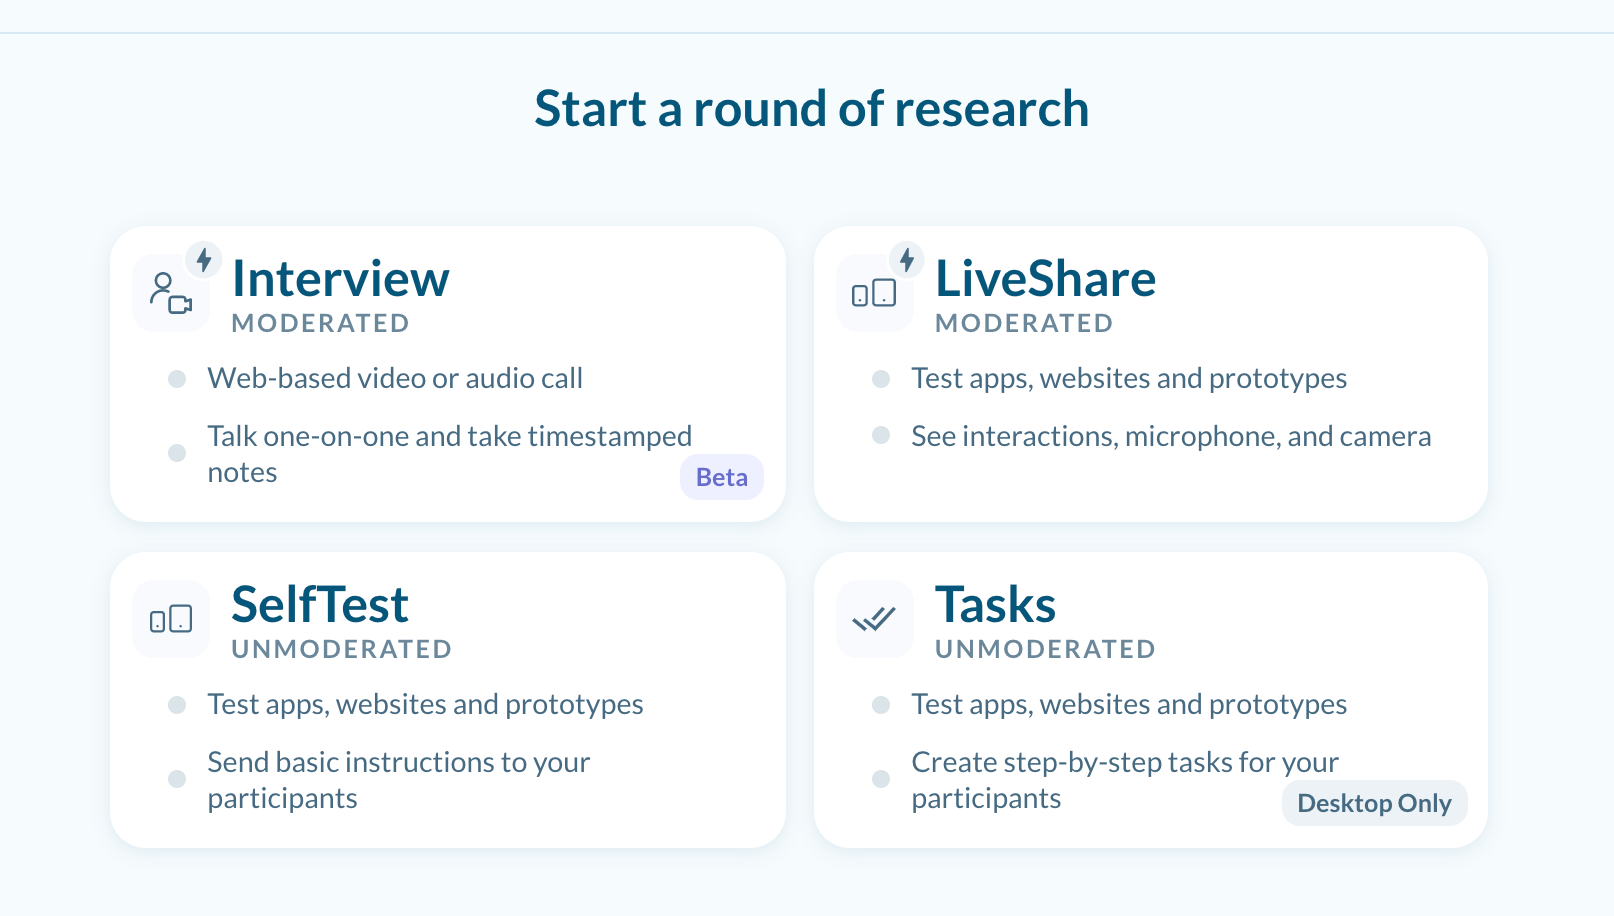 Choose a Round Type : Interview, LiveShare, SelfTest, Tasks for Desktop